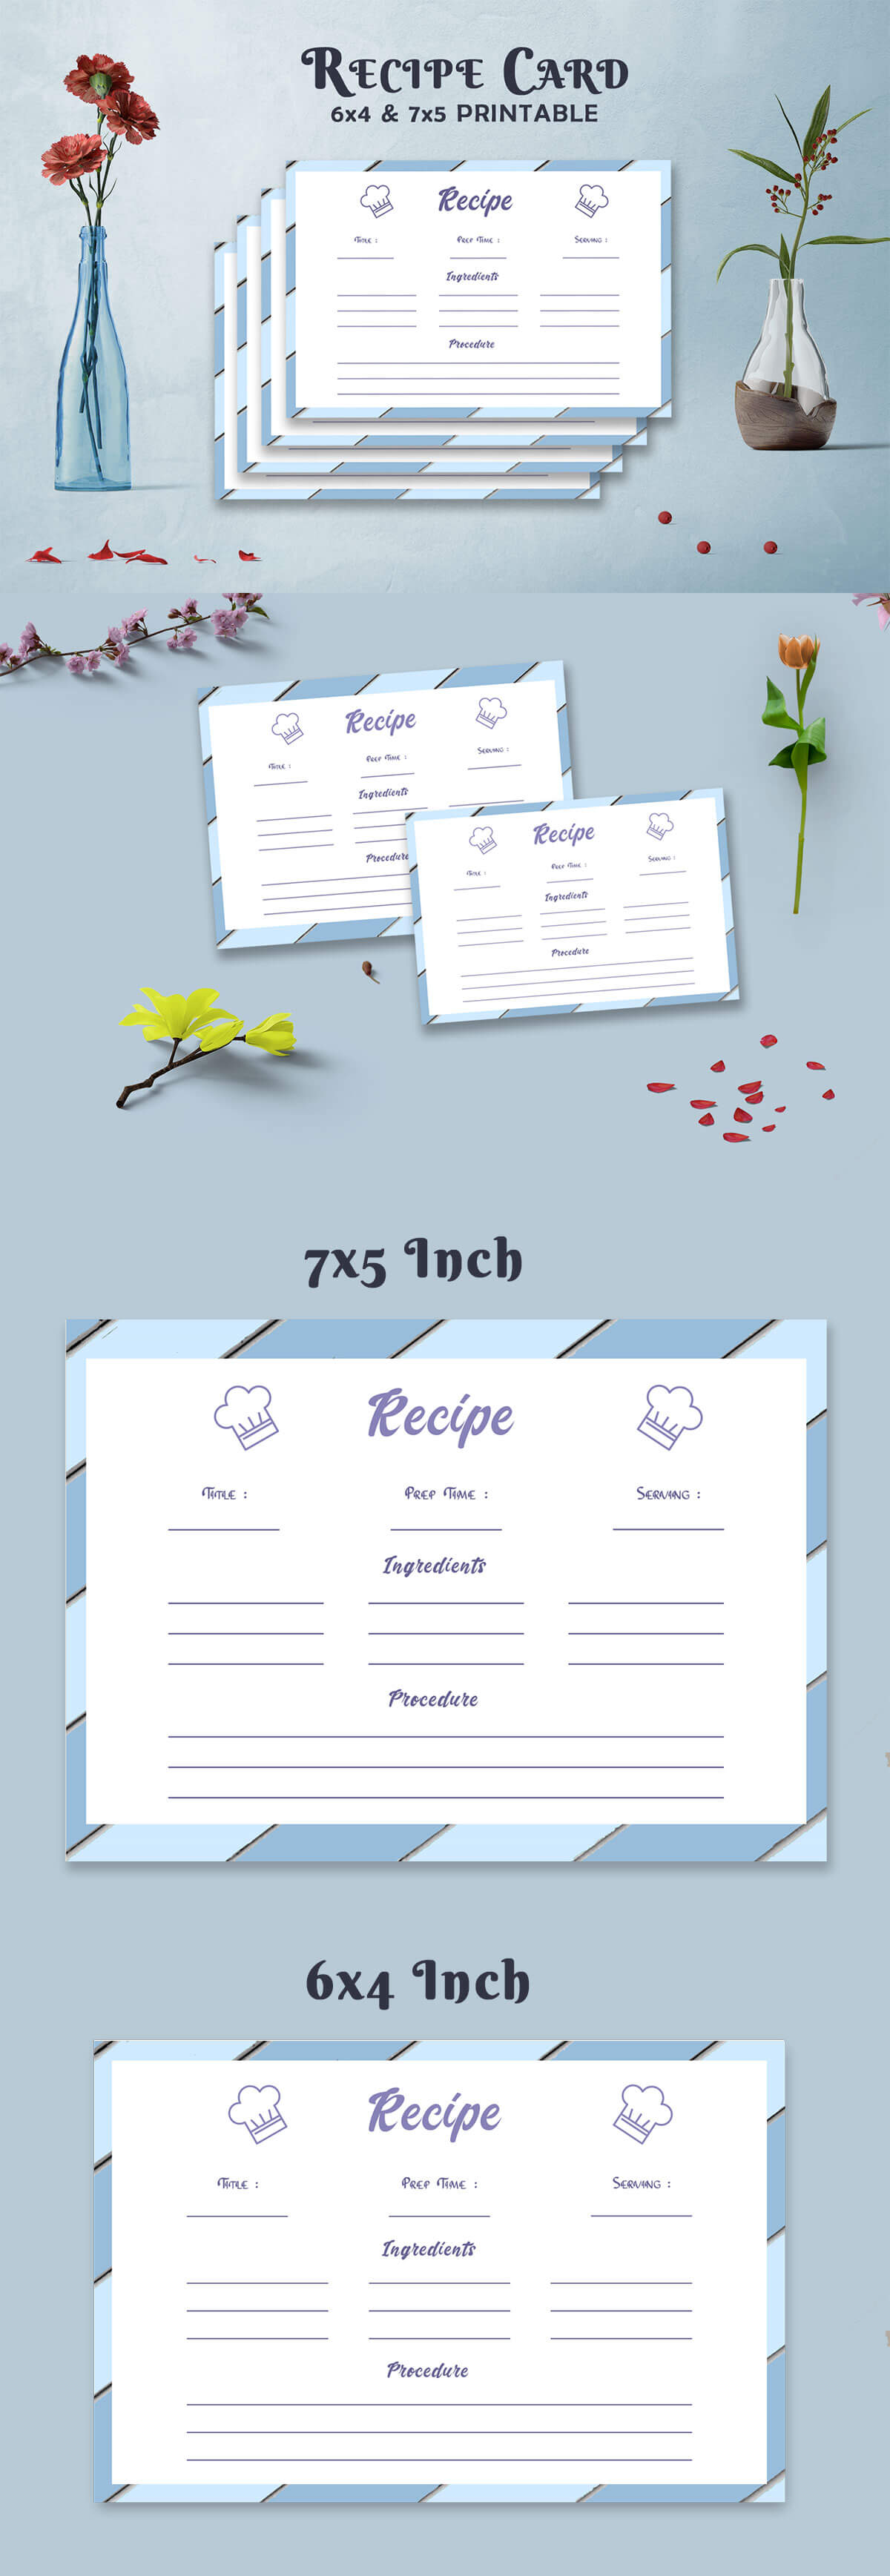 Free Recipe Card Printable Template V10